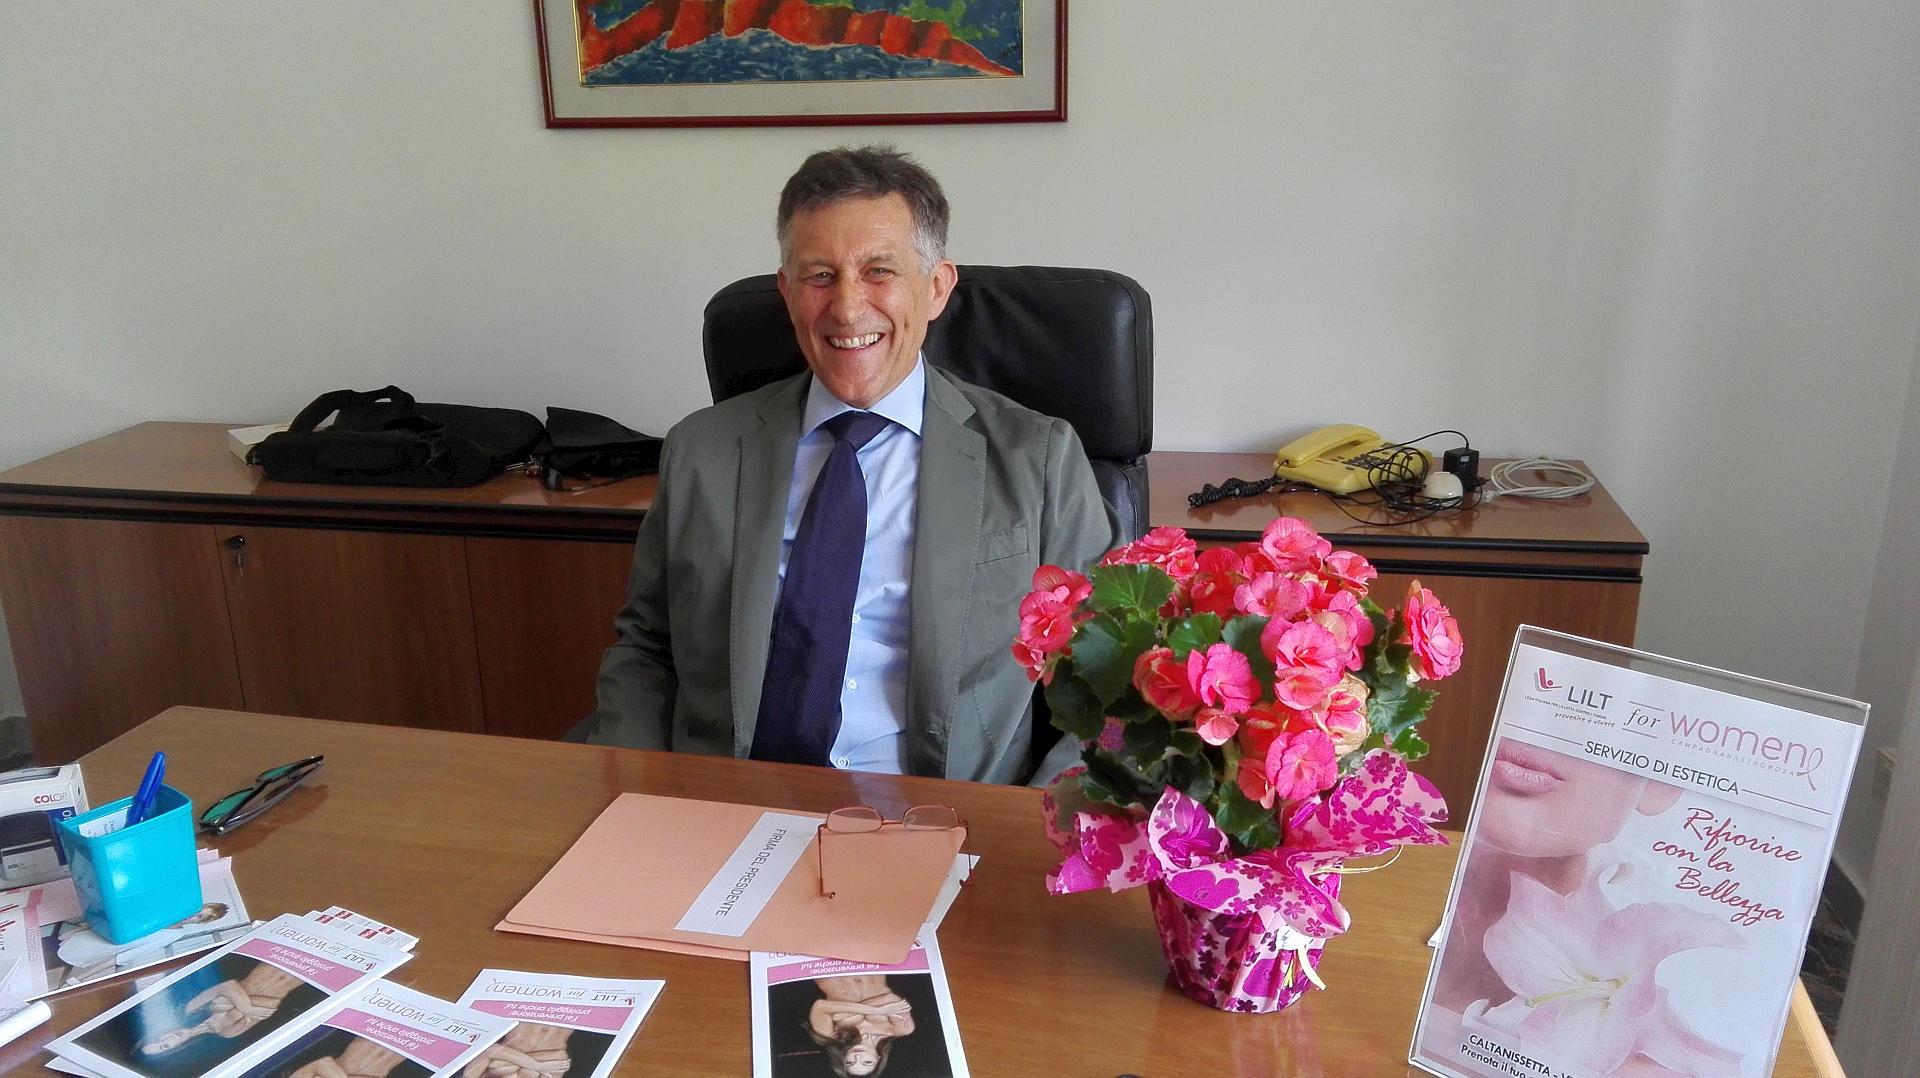 Aldo Amico, presidente Lilt Caltanissetta